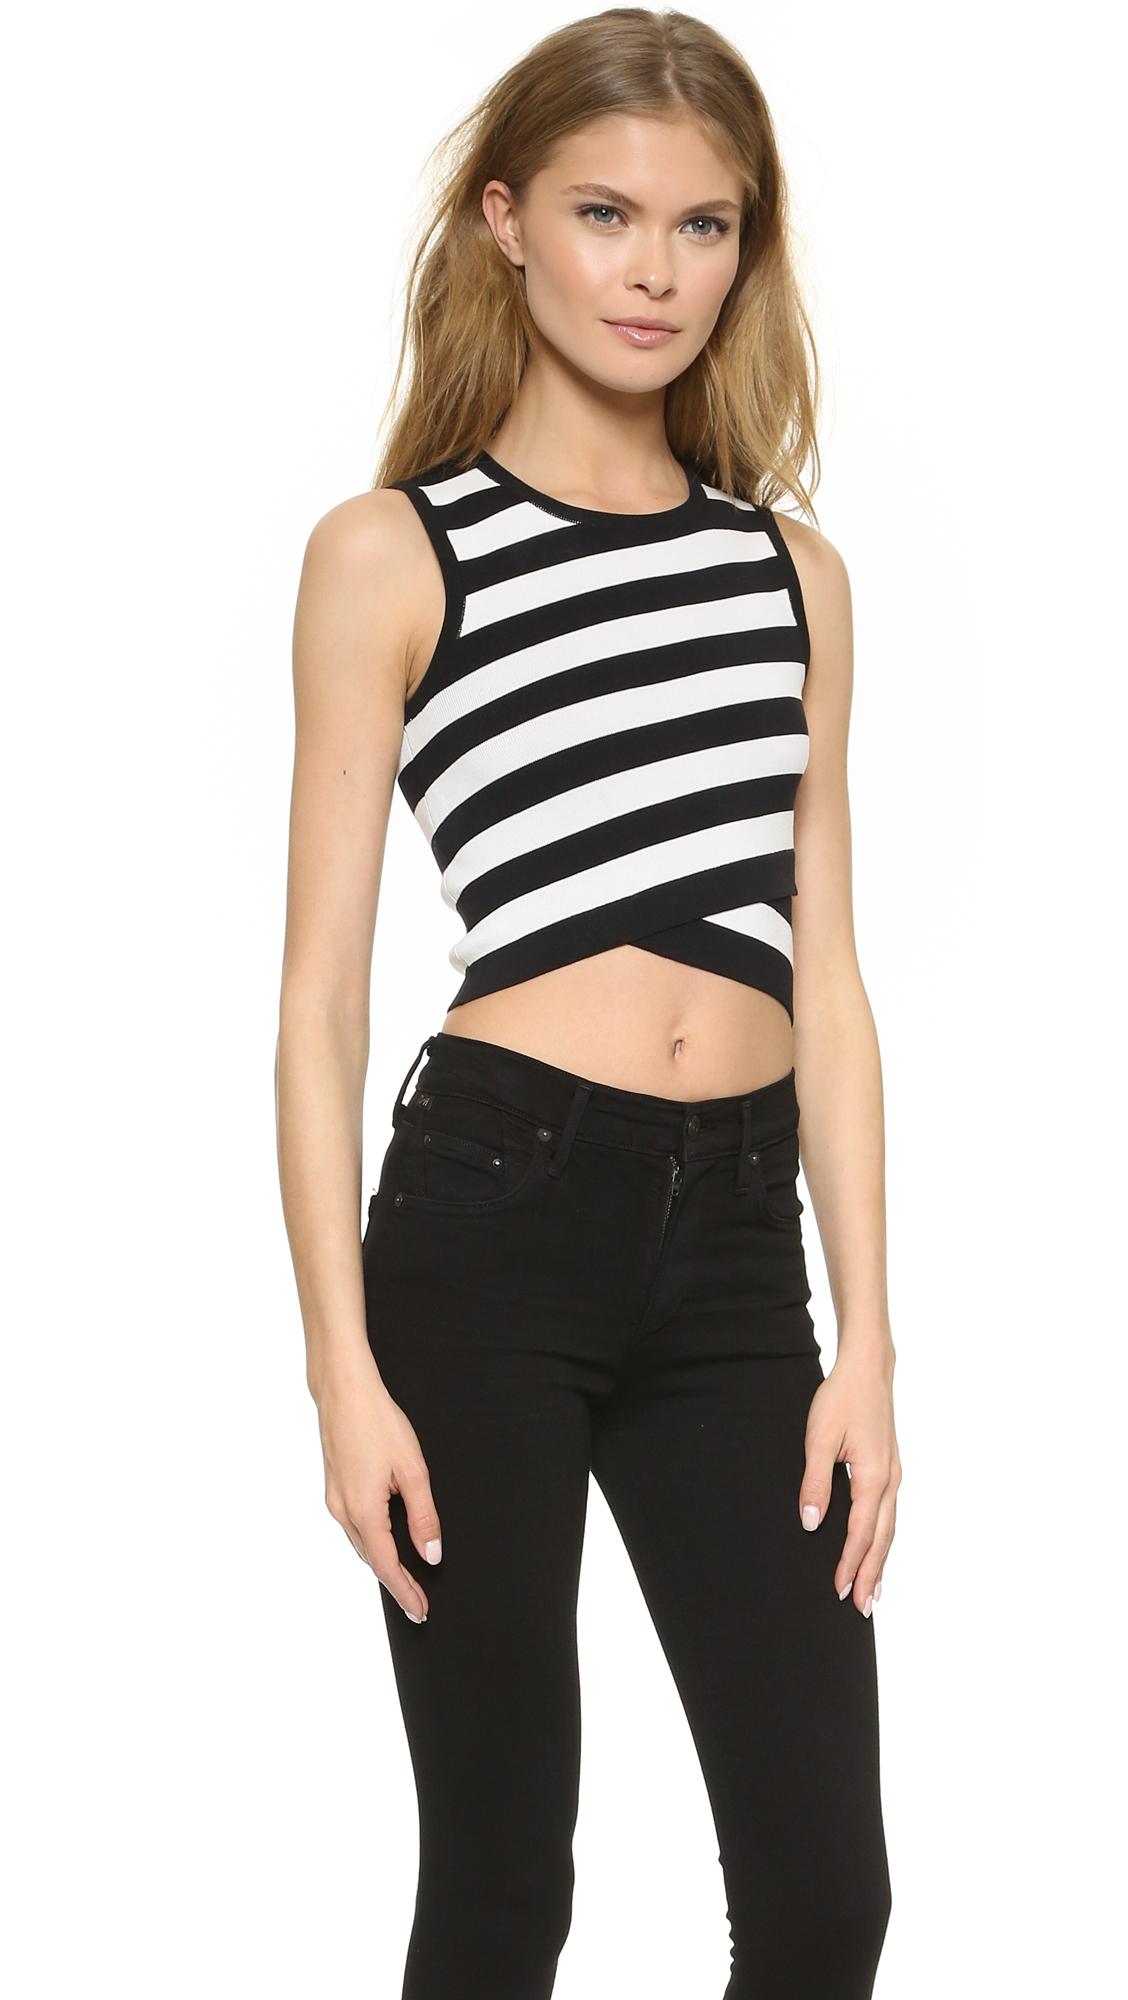 c05f6f335cf8d DKNY Striped Sleeveless Crop Top - Black/white in Black - Lyst